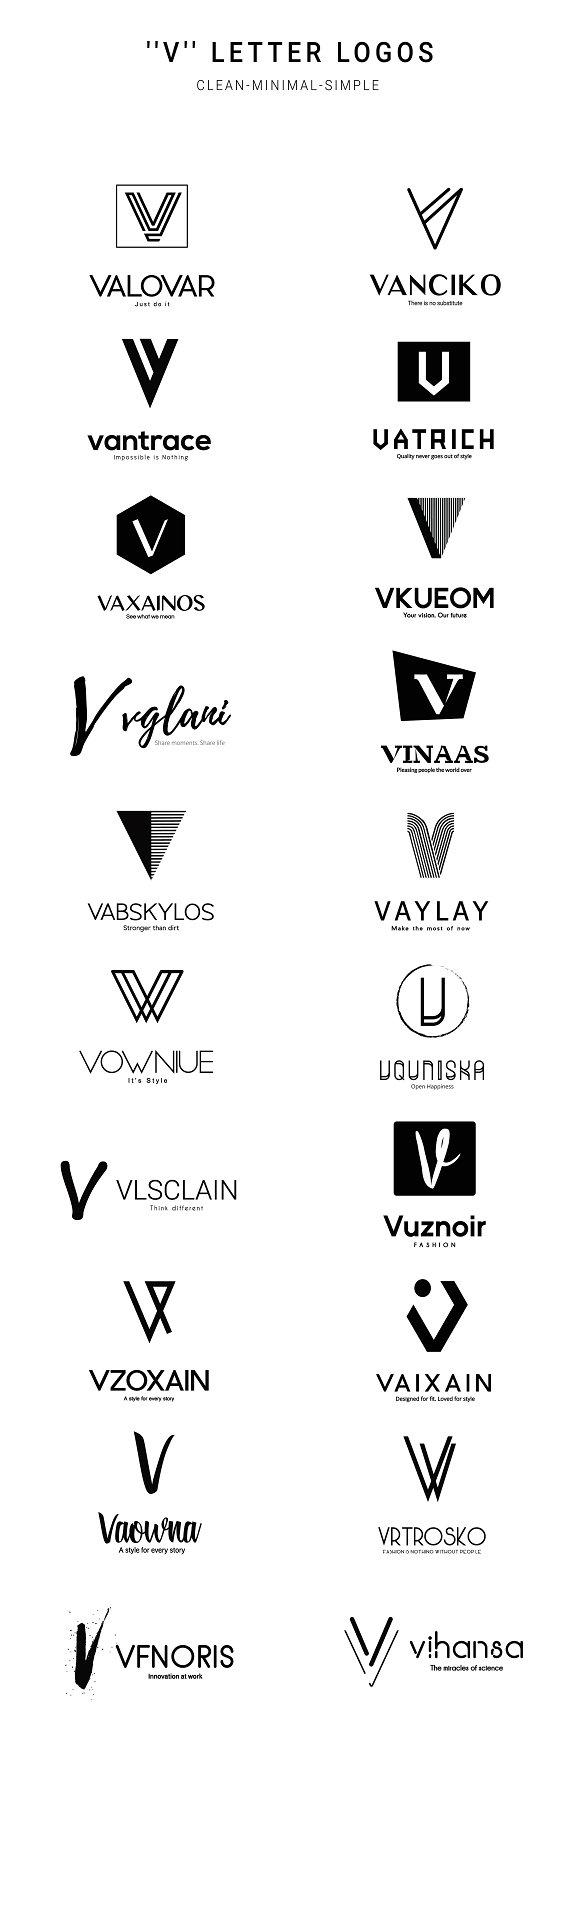 20 V Letter Alphabetic Logos Logo Templates Creative Market